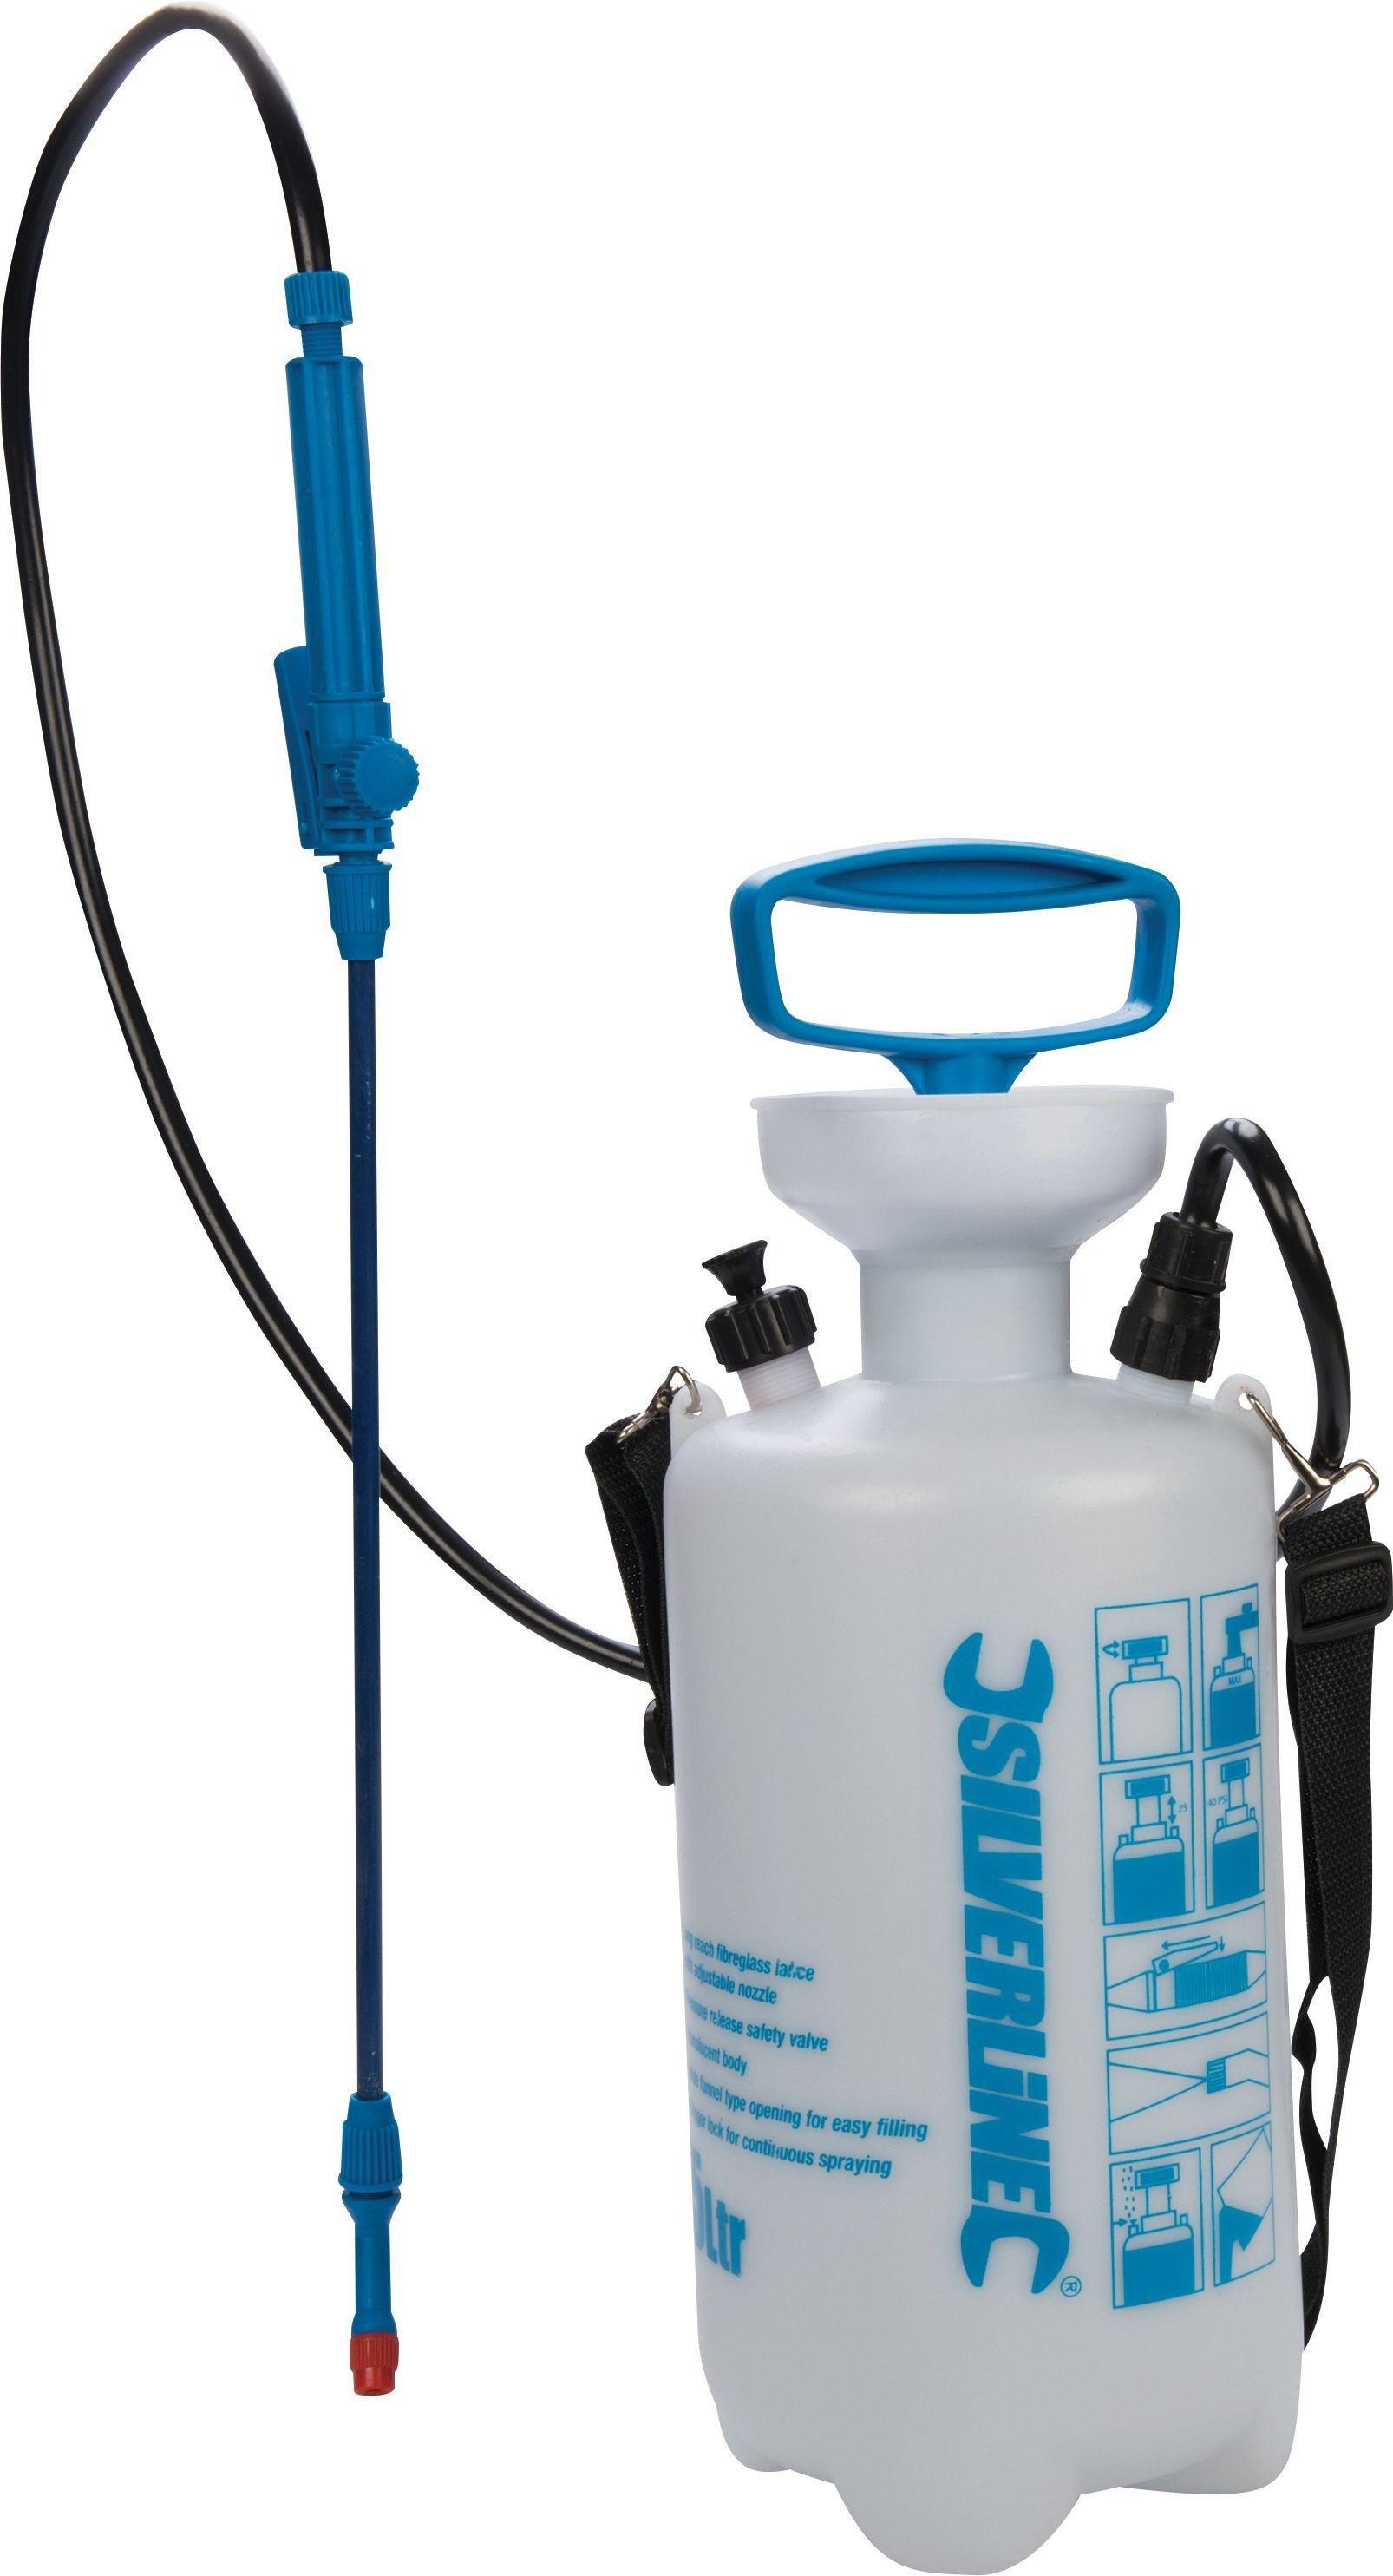 Silverline 675108 Pump-Up Pressure Sprayer - 5Ltr Capacity